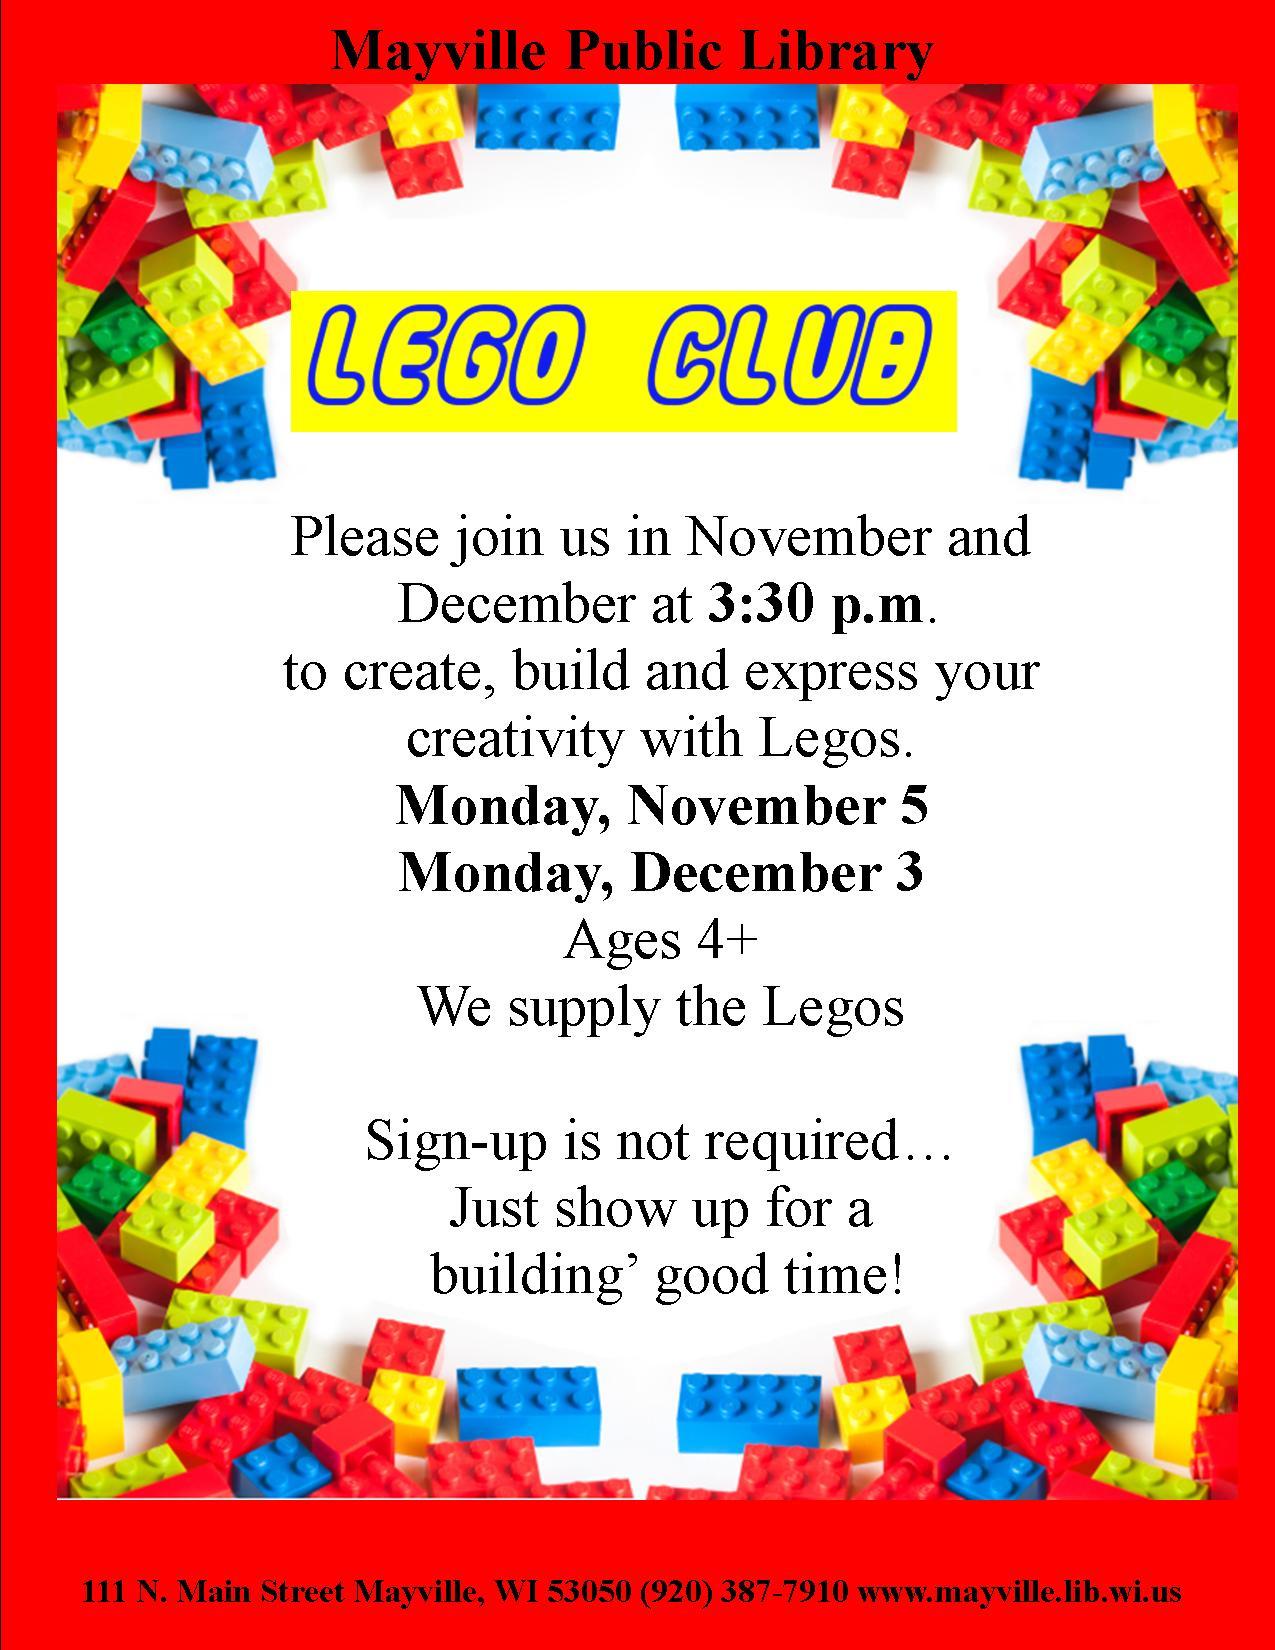 Lego Club Mayville Public Library